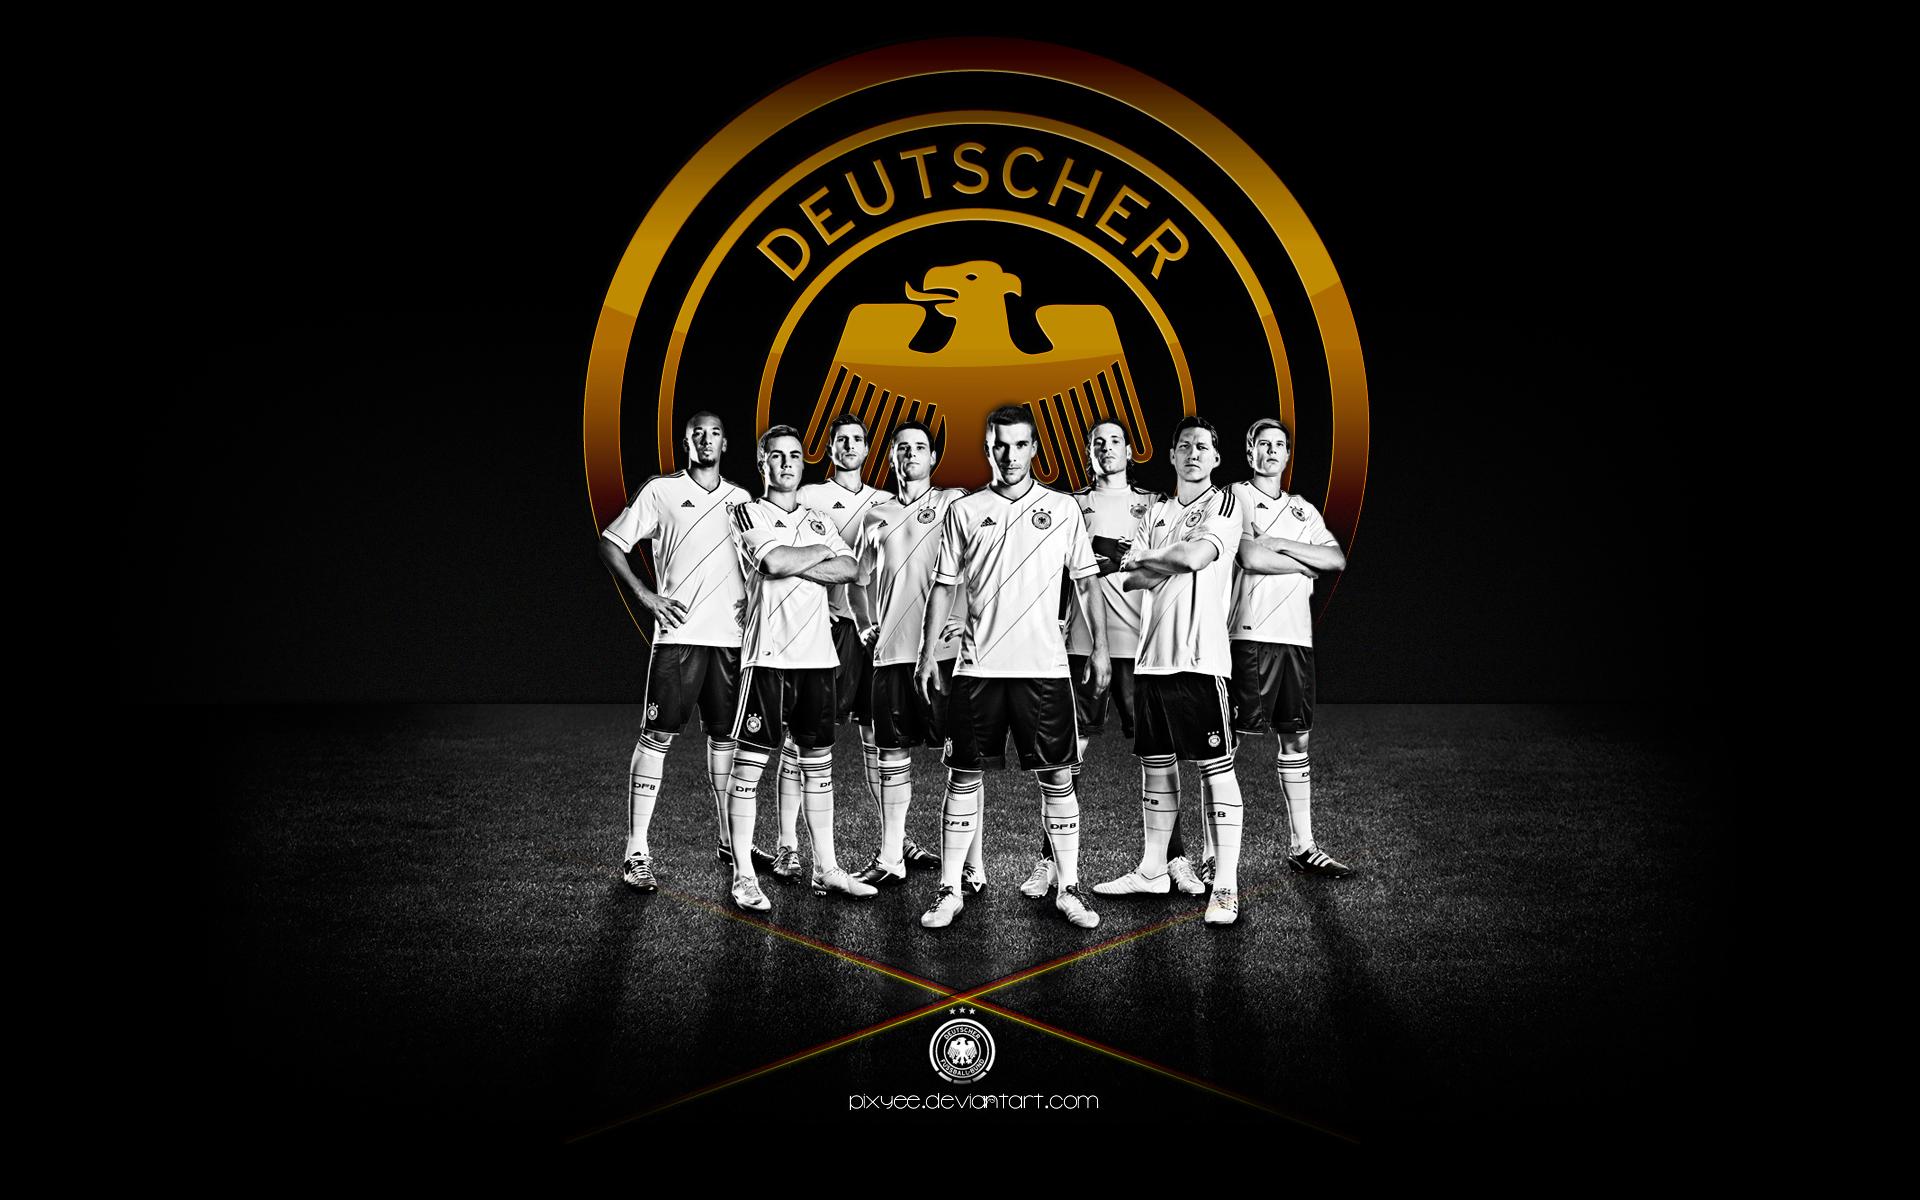 Deutscher Fussball Bund 2012 Wallpaper Germany By Pixyee